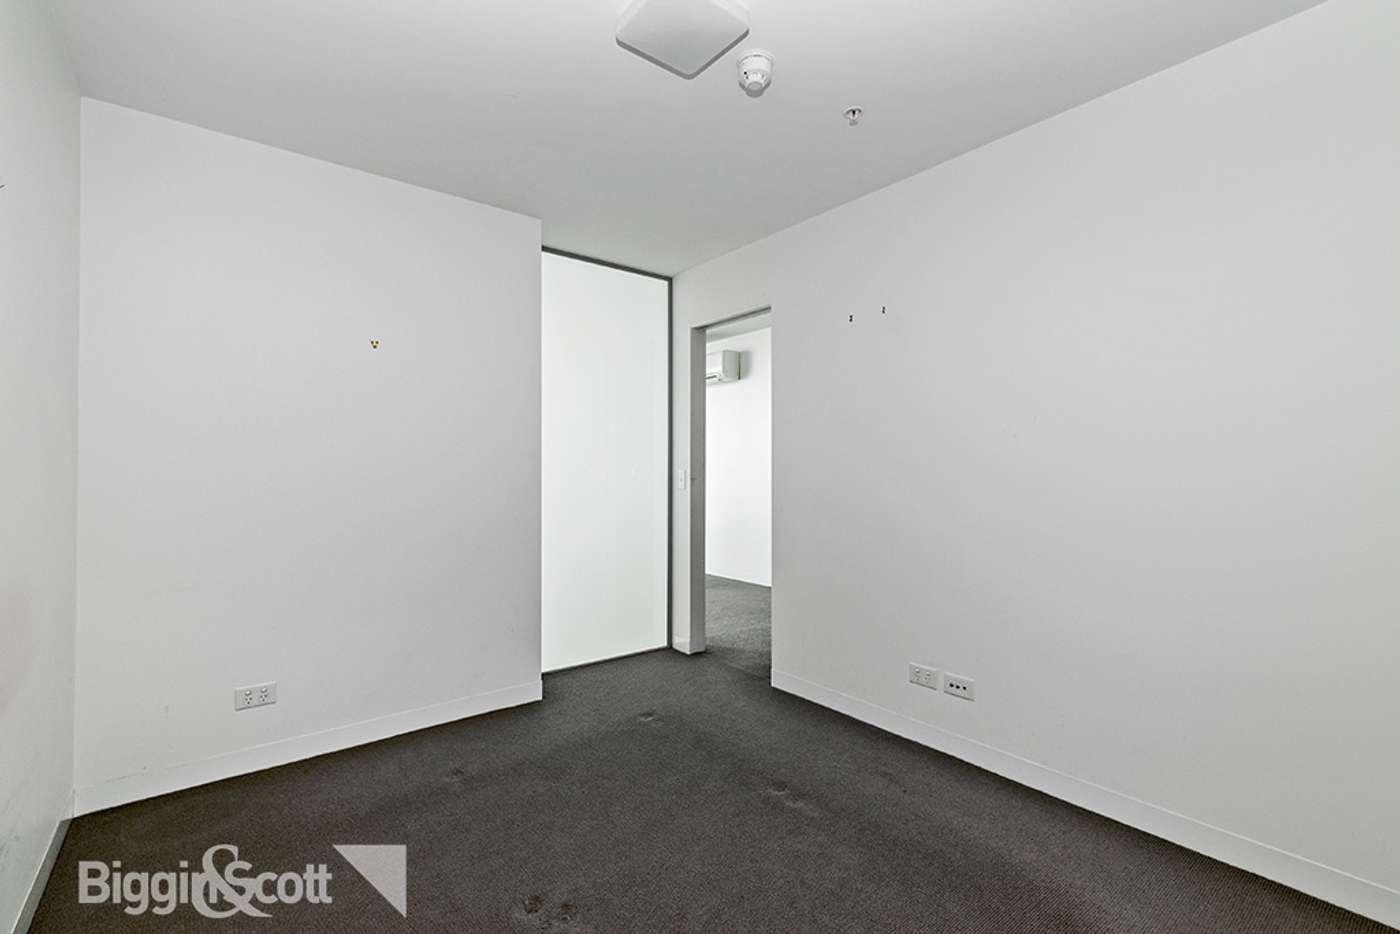 Sixth view of Homely apartment listing, 121/15 Clifton Street, Prahran VIC 3181